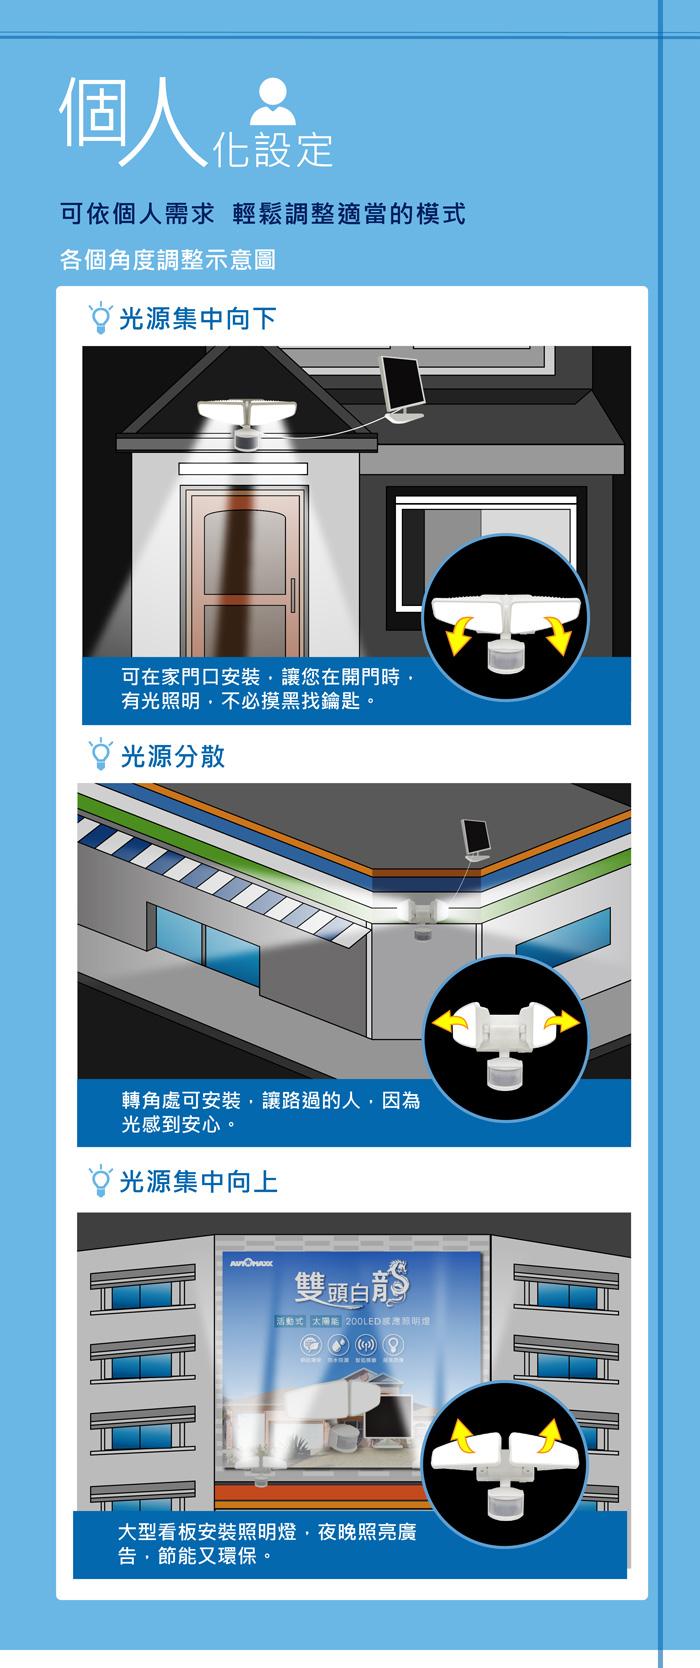 AUTOMAXX活動式太陽能200LED感應照明燈UA-S200網頁 產品特色描述